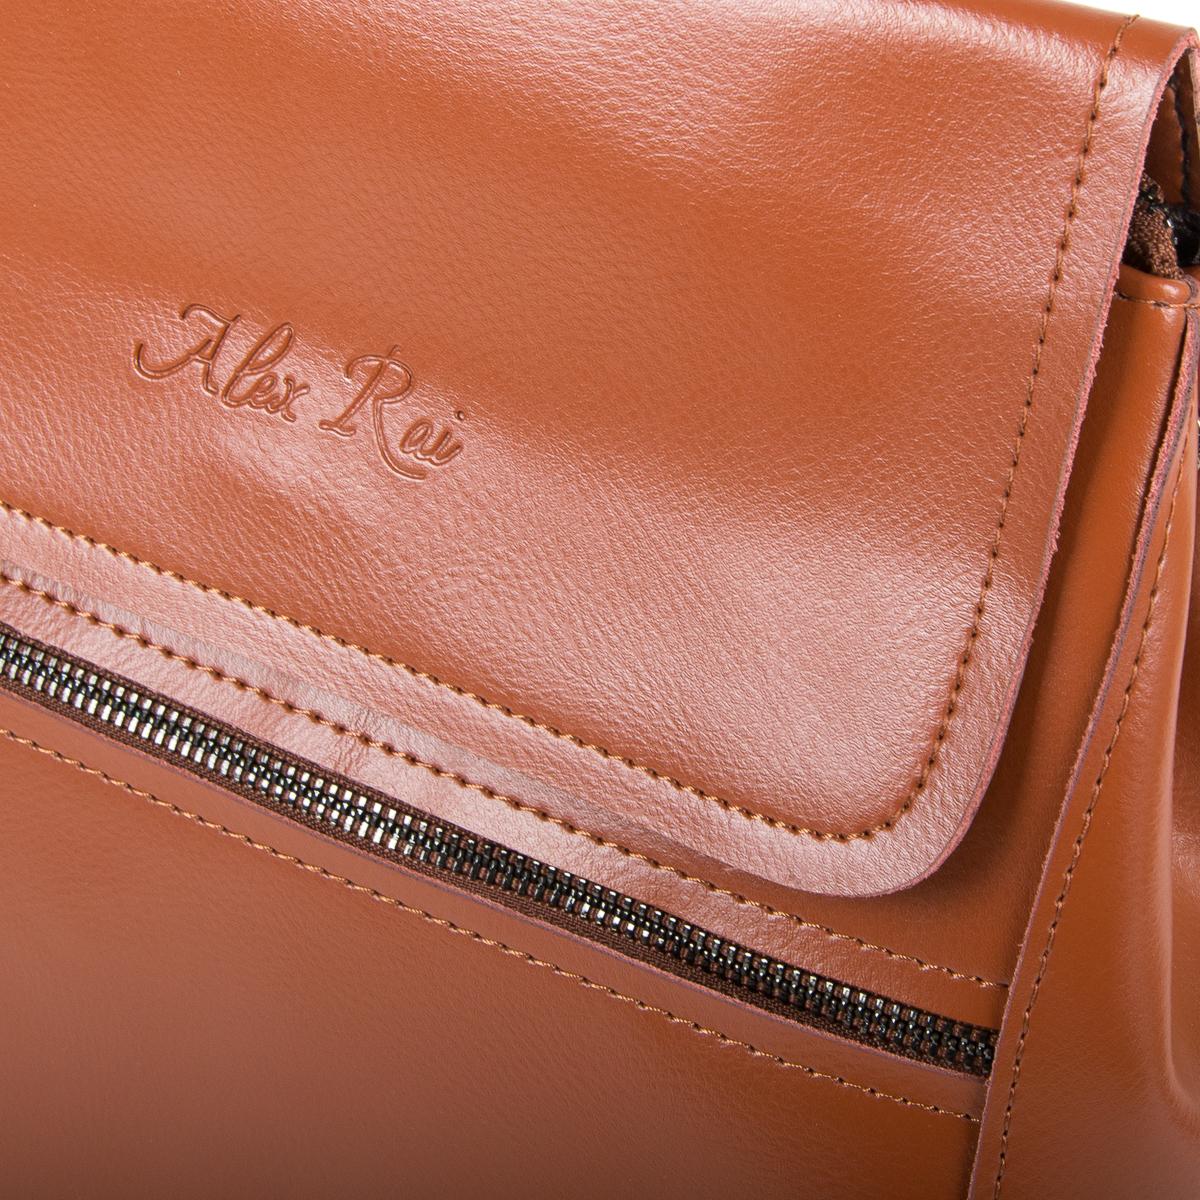 Сумка Женская Рюкзак кожа ALEX RAI 9-01 1005 khaki - фото 3